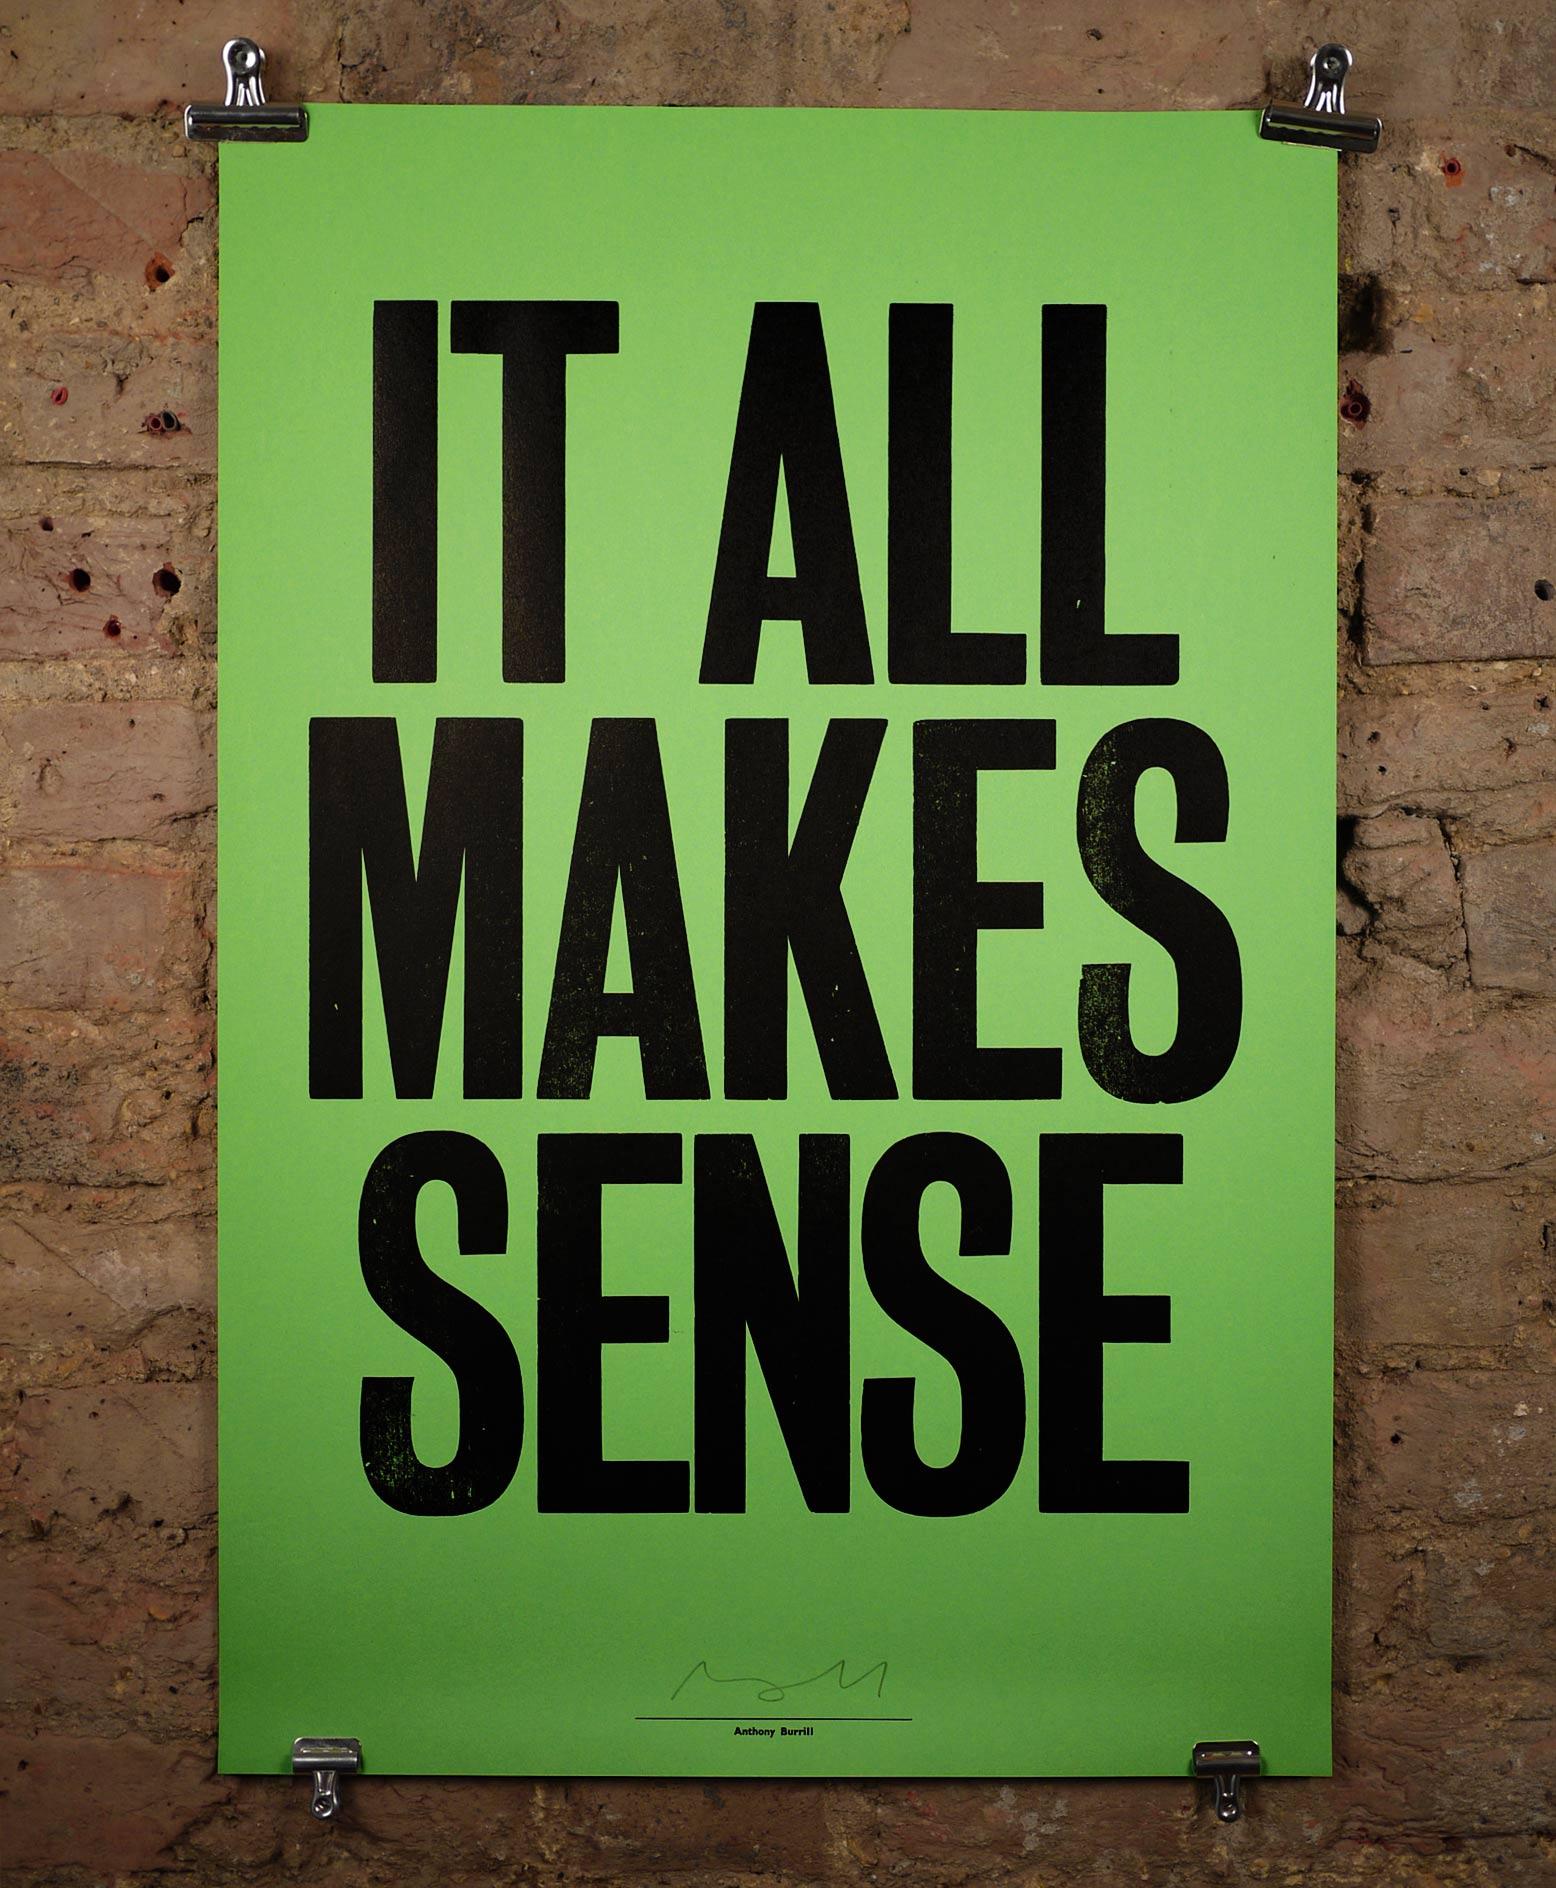 03050c056c66 It all makes sense by Anthony Burrill